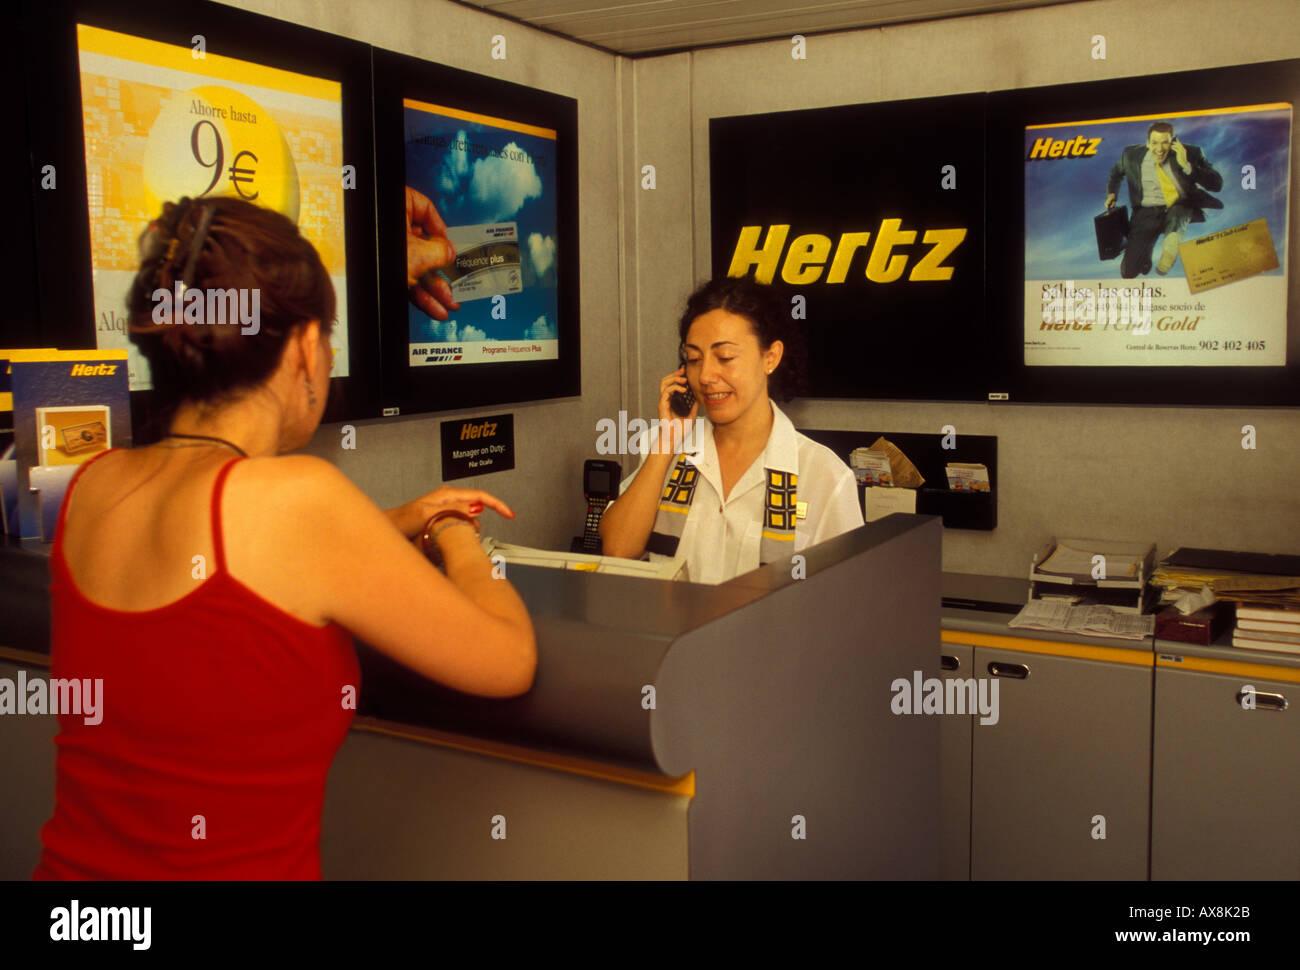 oficinas hertz madrid hertz car rental agency barajas international airport